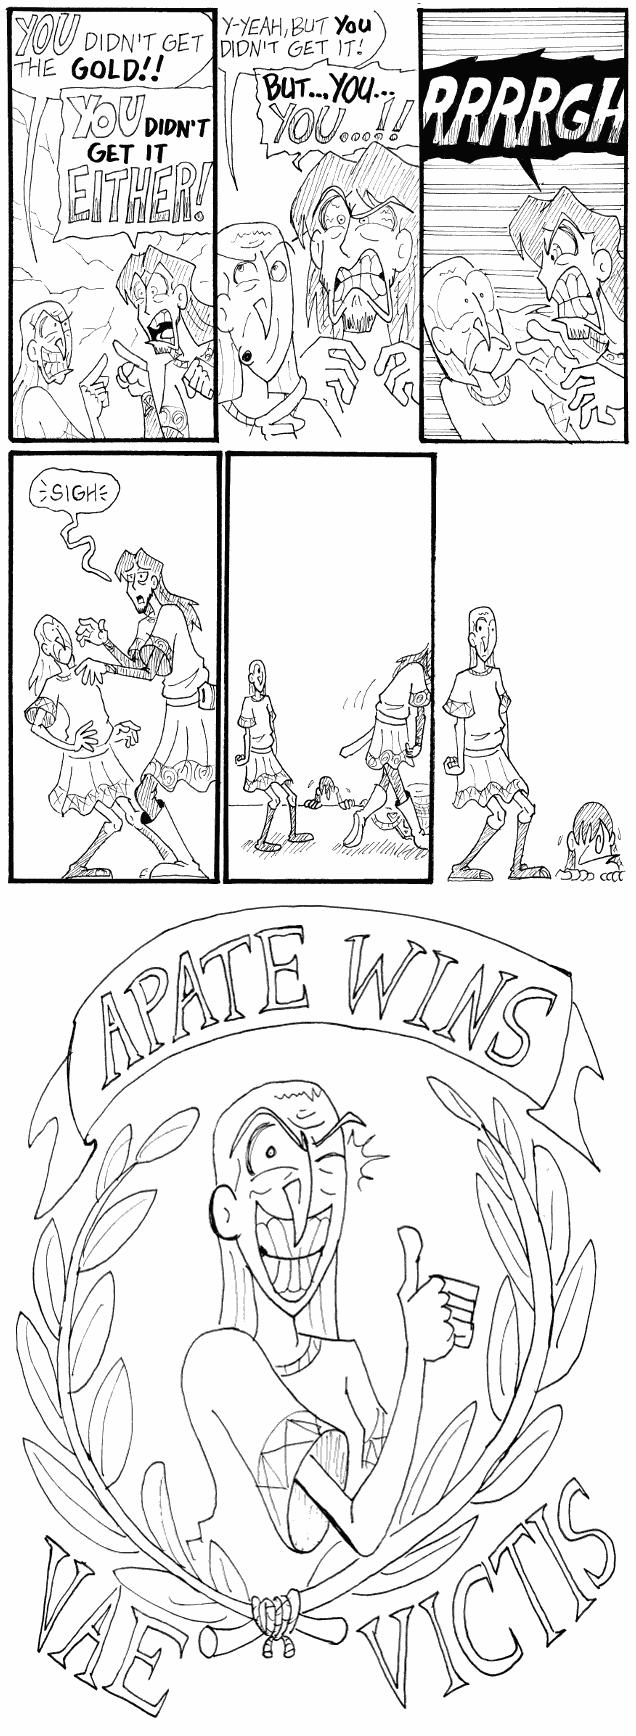 (#291) Apate Wins